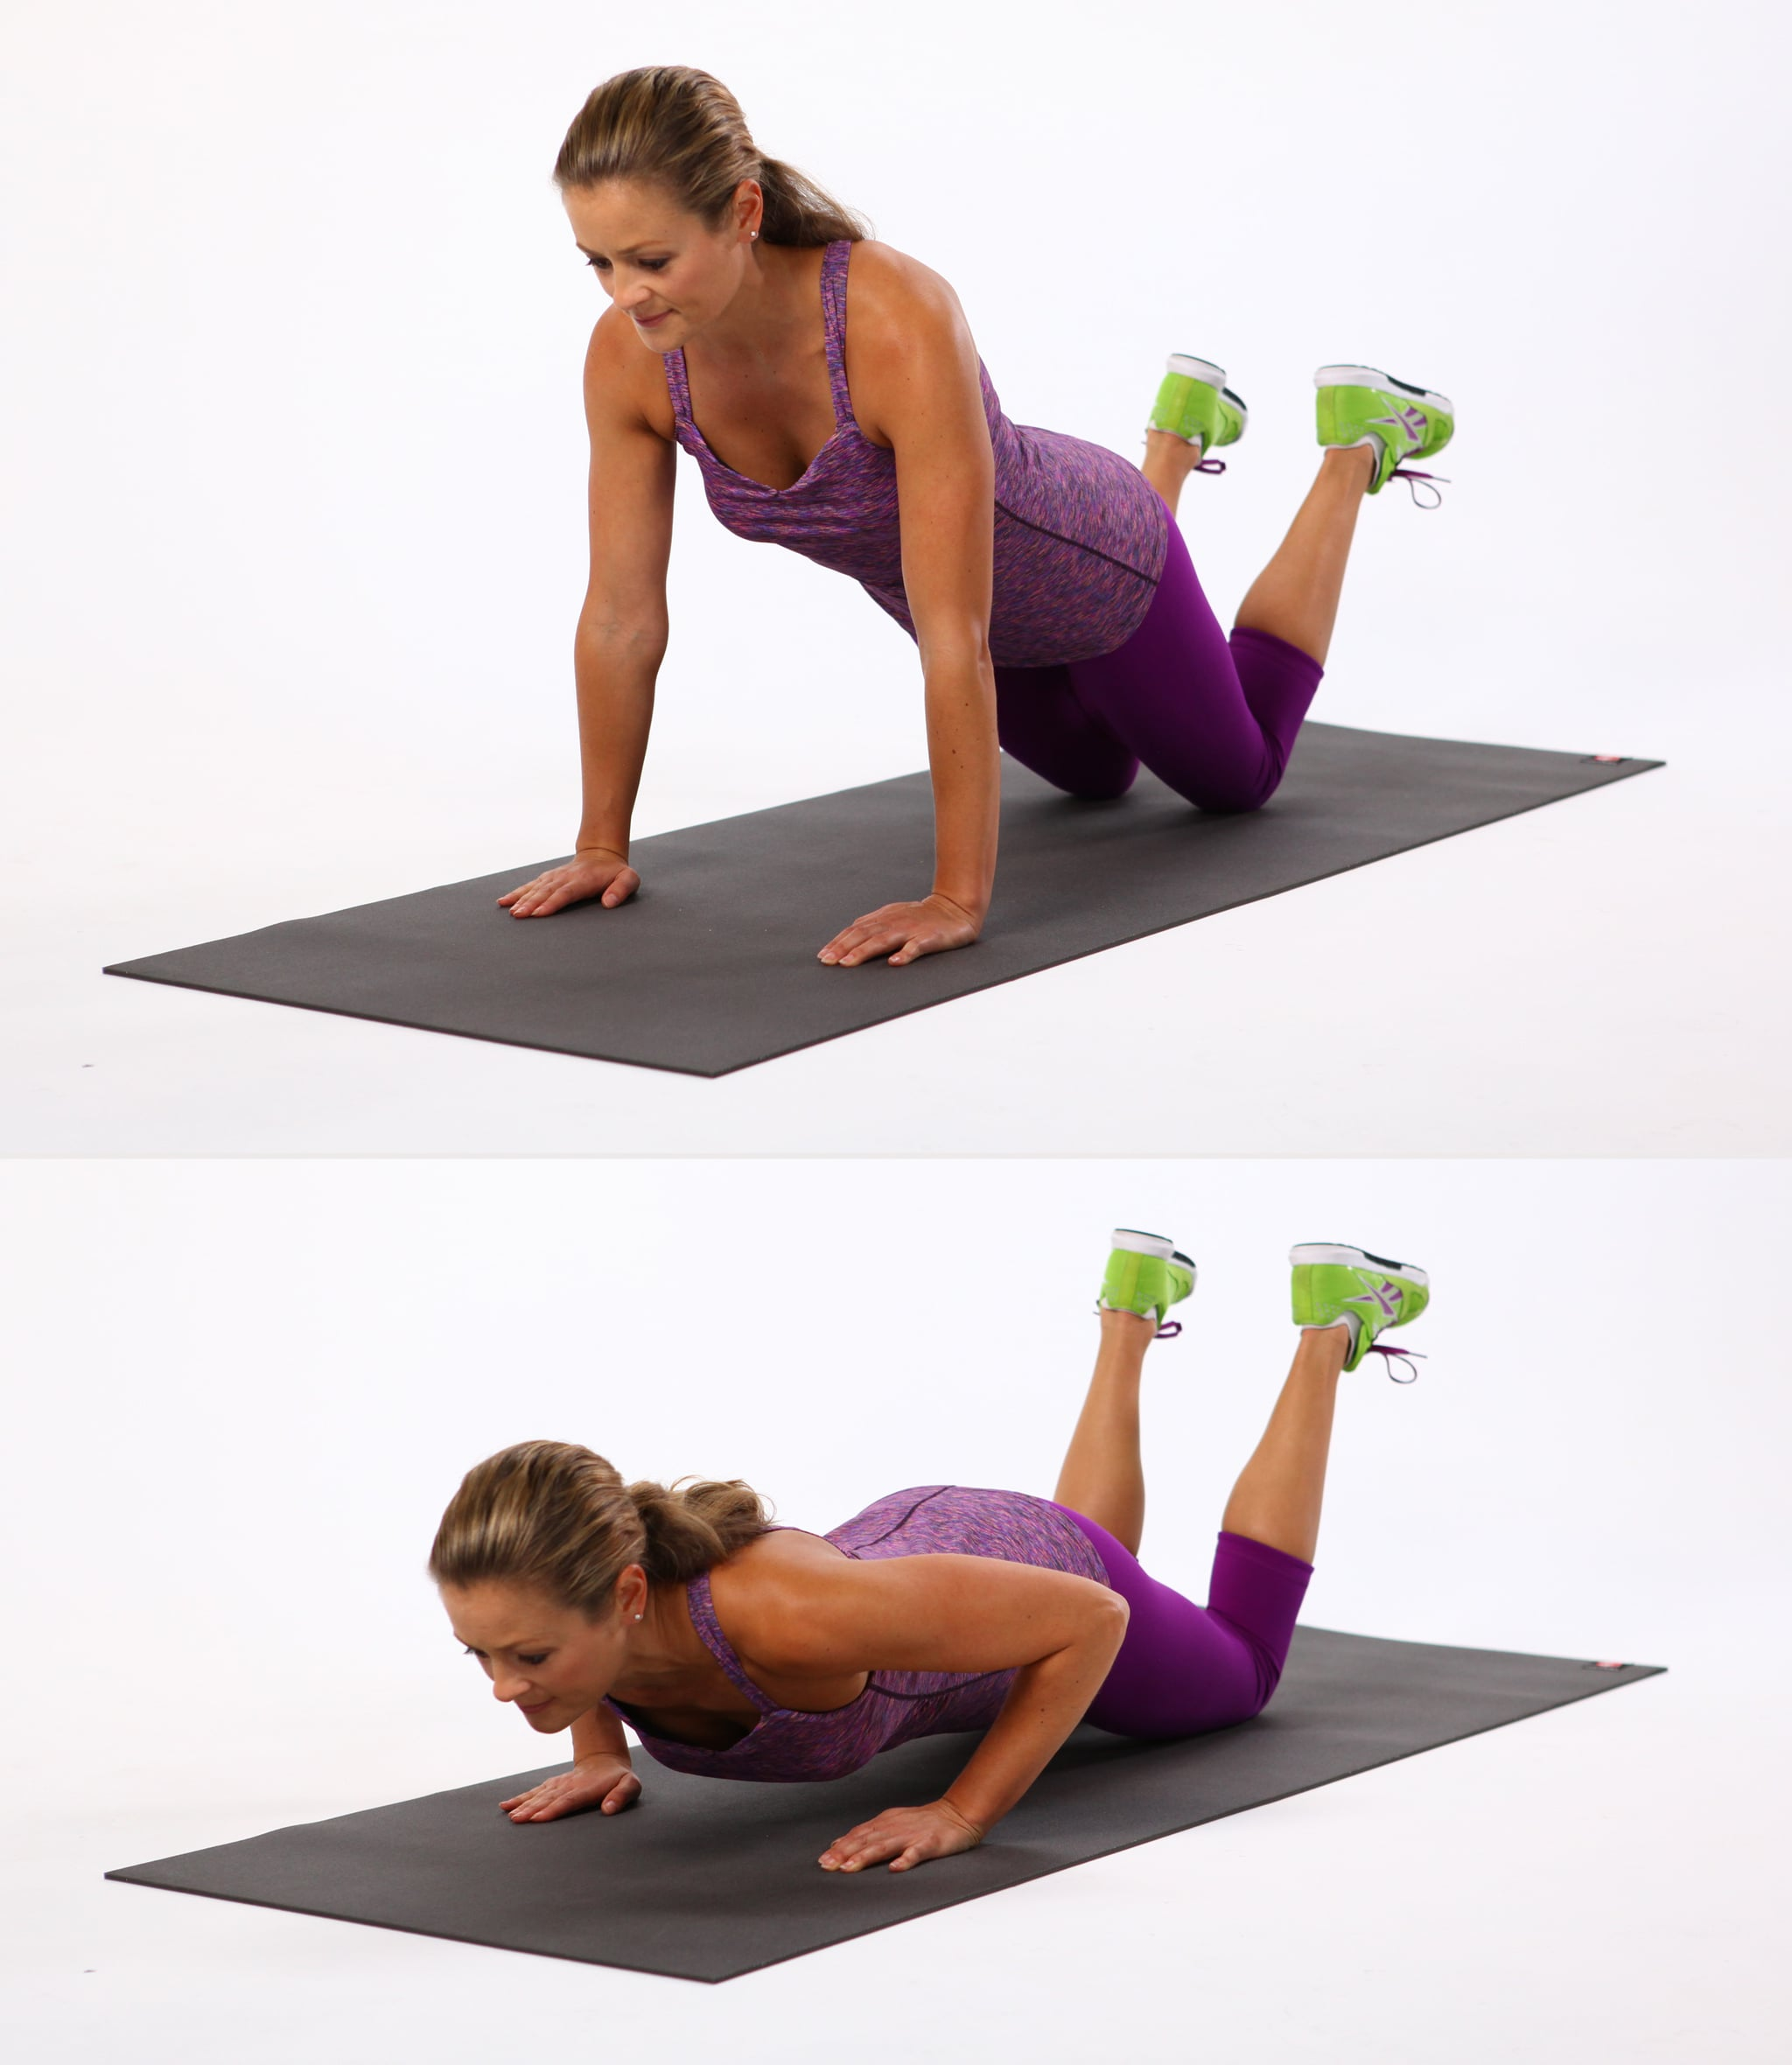 「push up knee」の画像検索結果